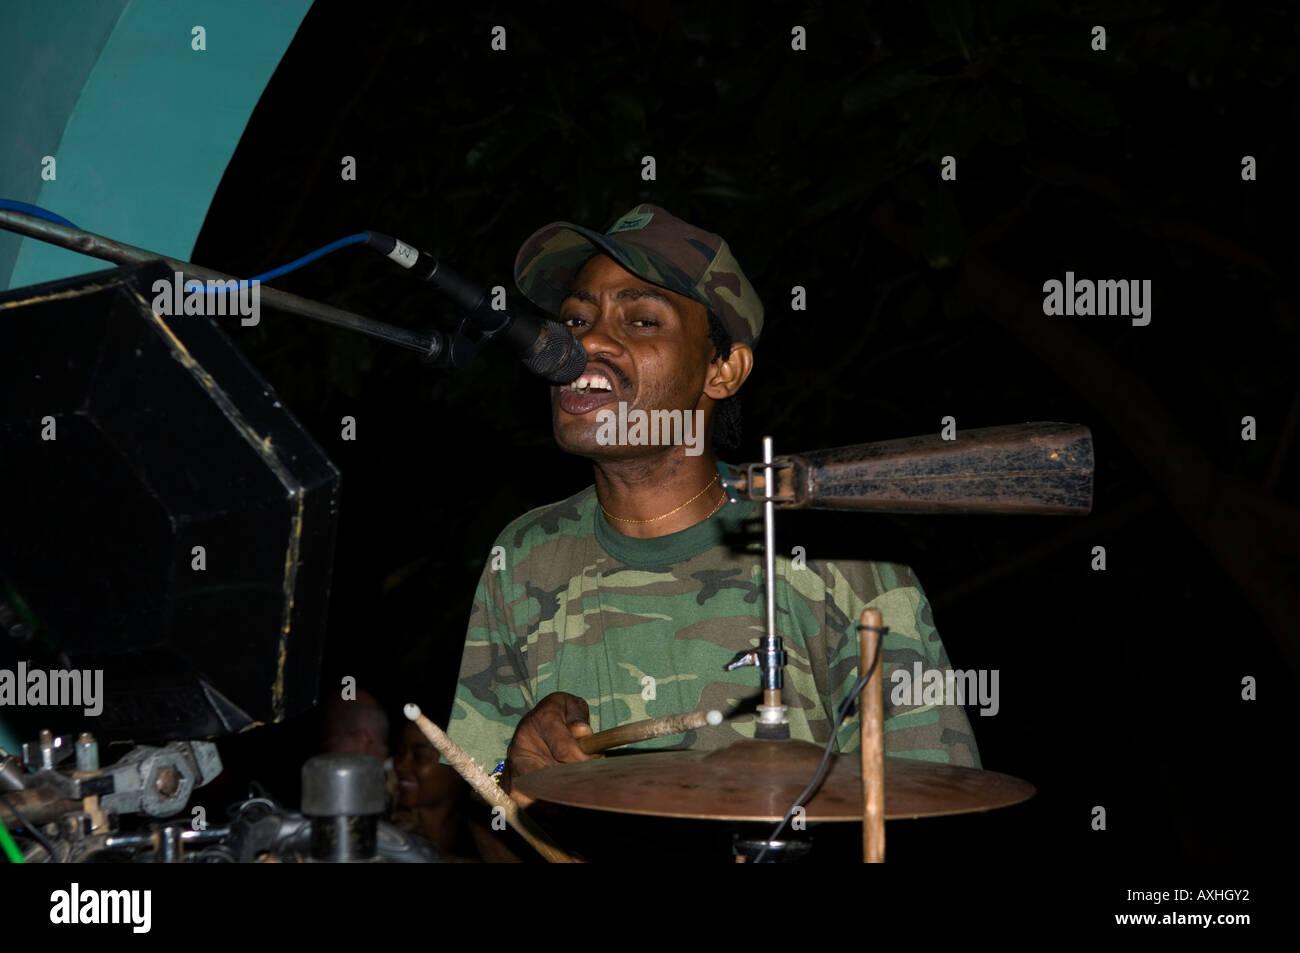 Tanzania Dar es Salaam band playing at a nightclub Stock